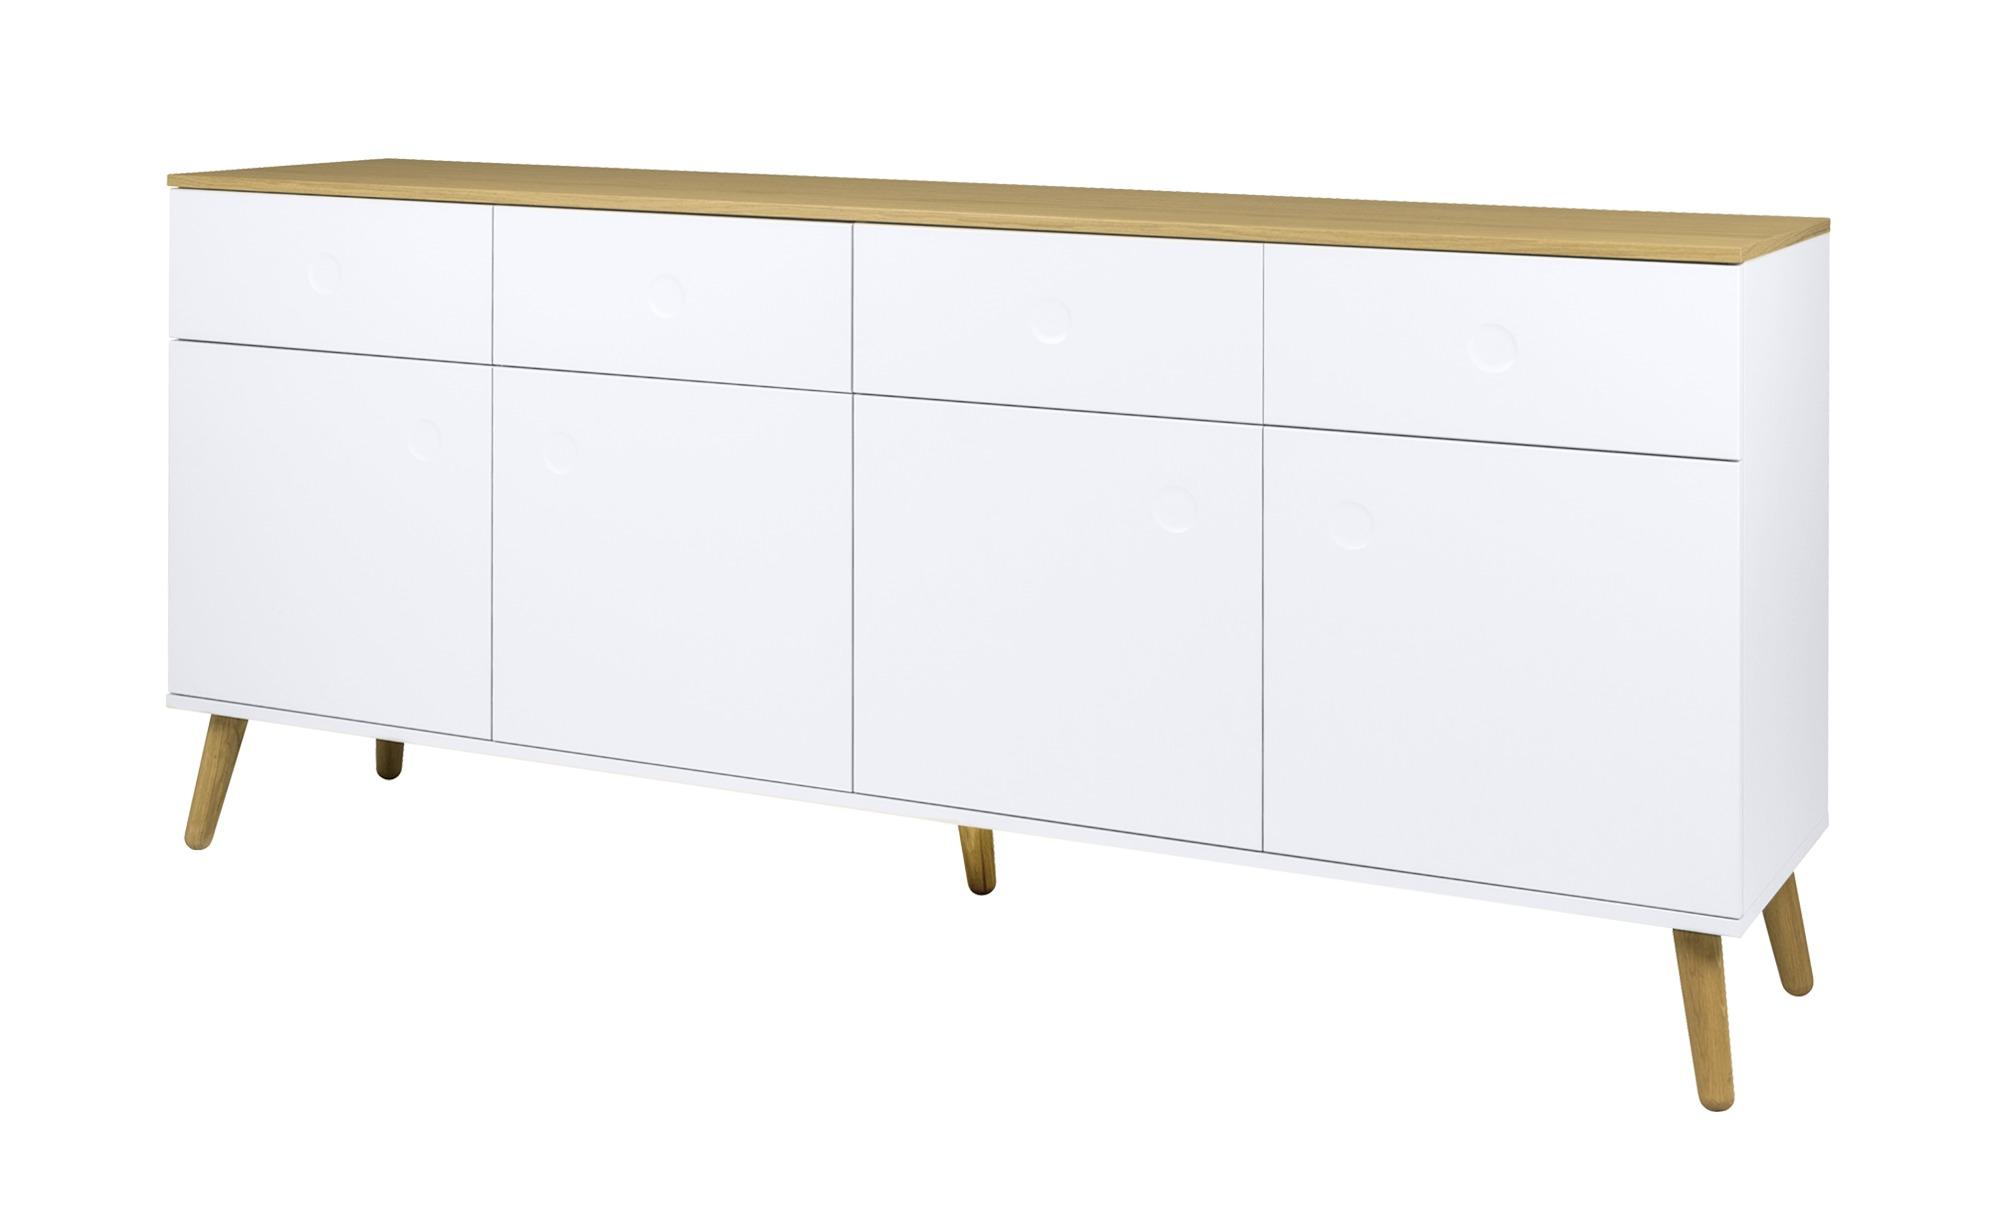 Roomers Sideboard  Scan ¦ Maße (cm): B: 192 H: 86 T: 43 Kommoden & Sideboards > Sideboards - Höffner